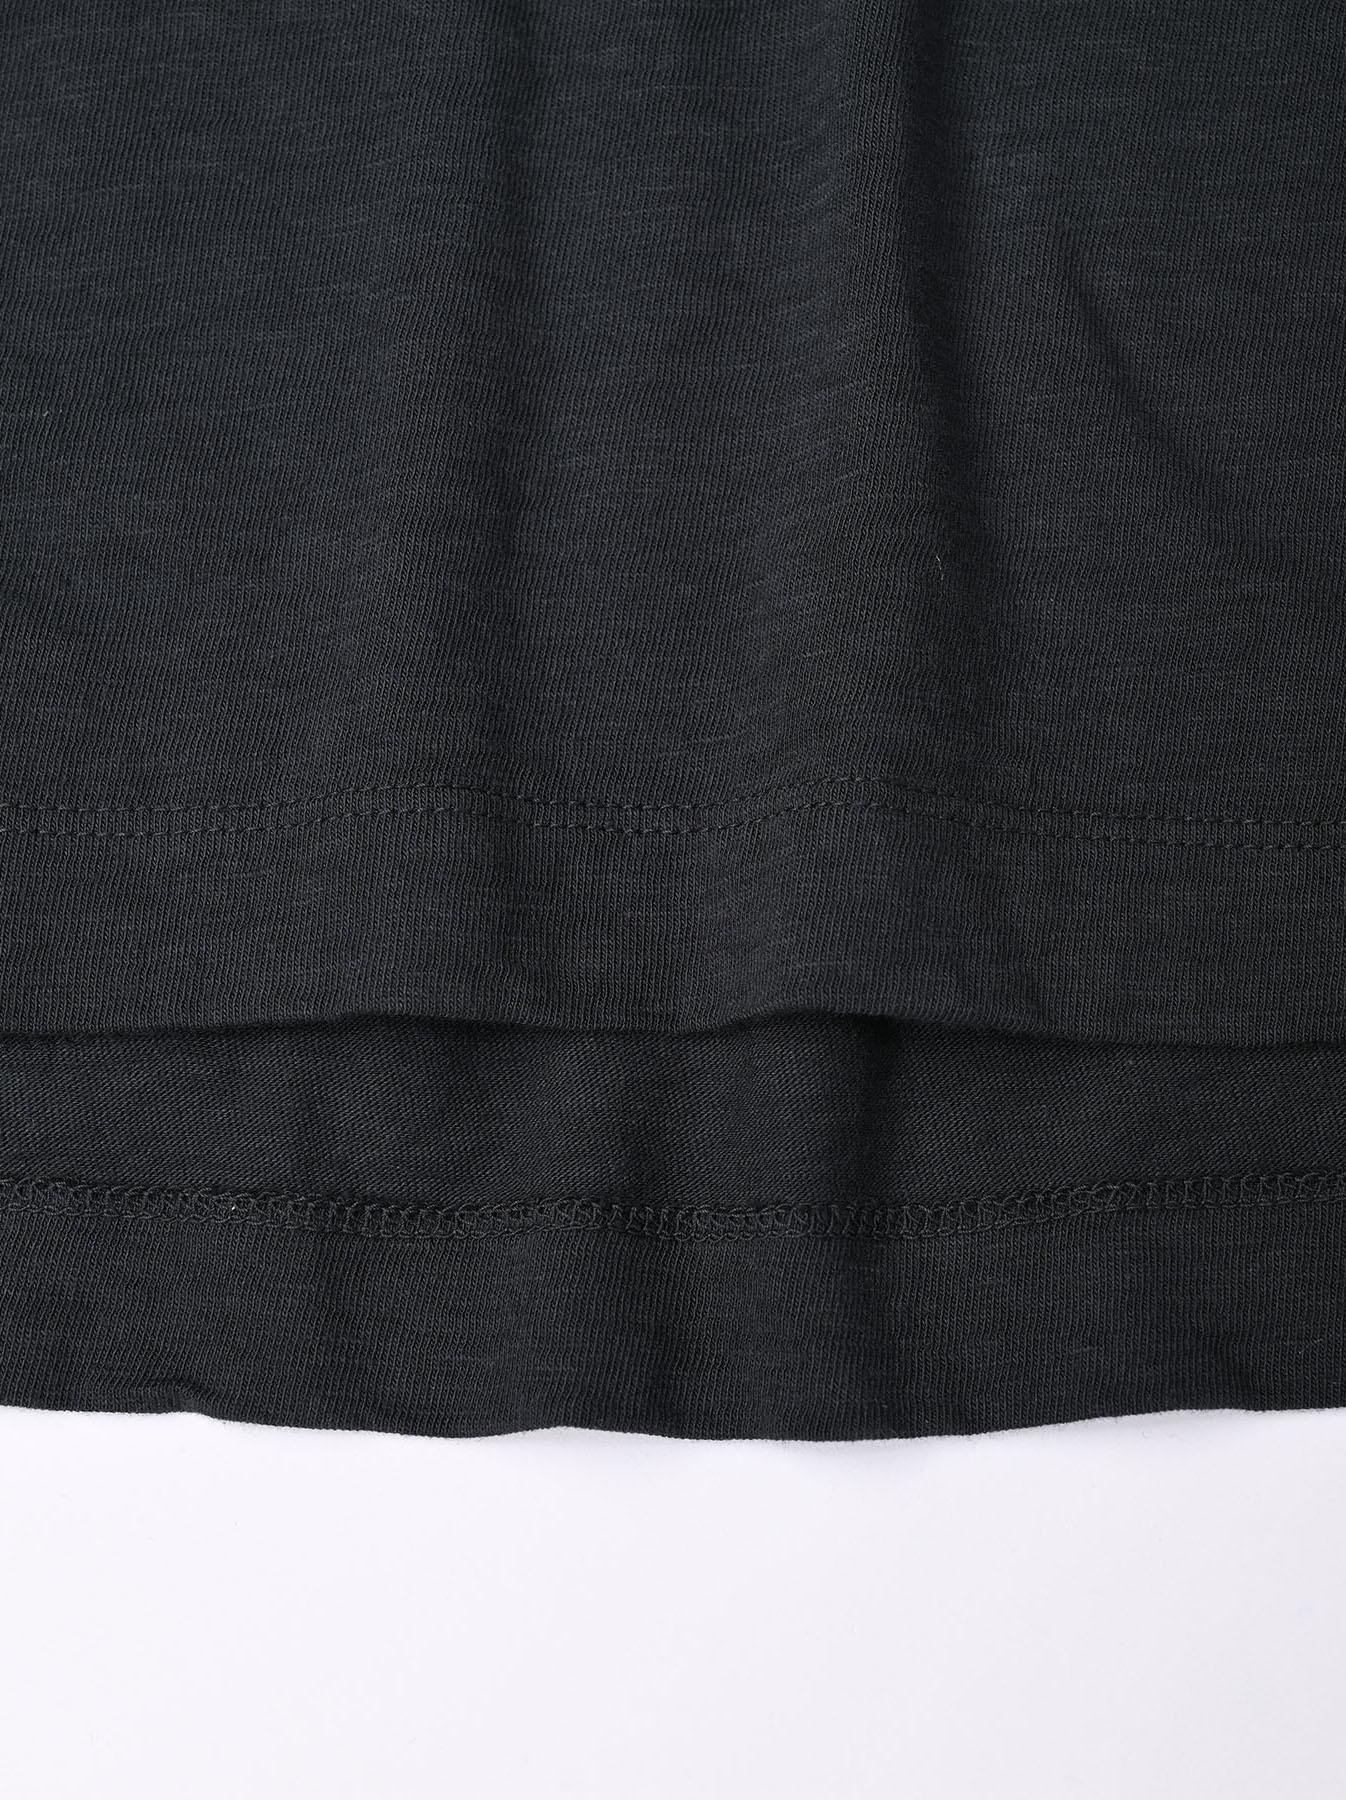 Zimbabwe Cotton Ocean Long-sleeved T-shirt-9